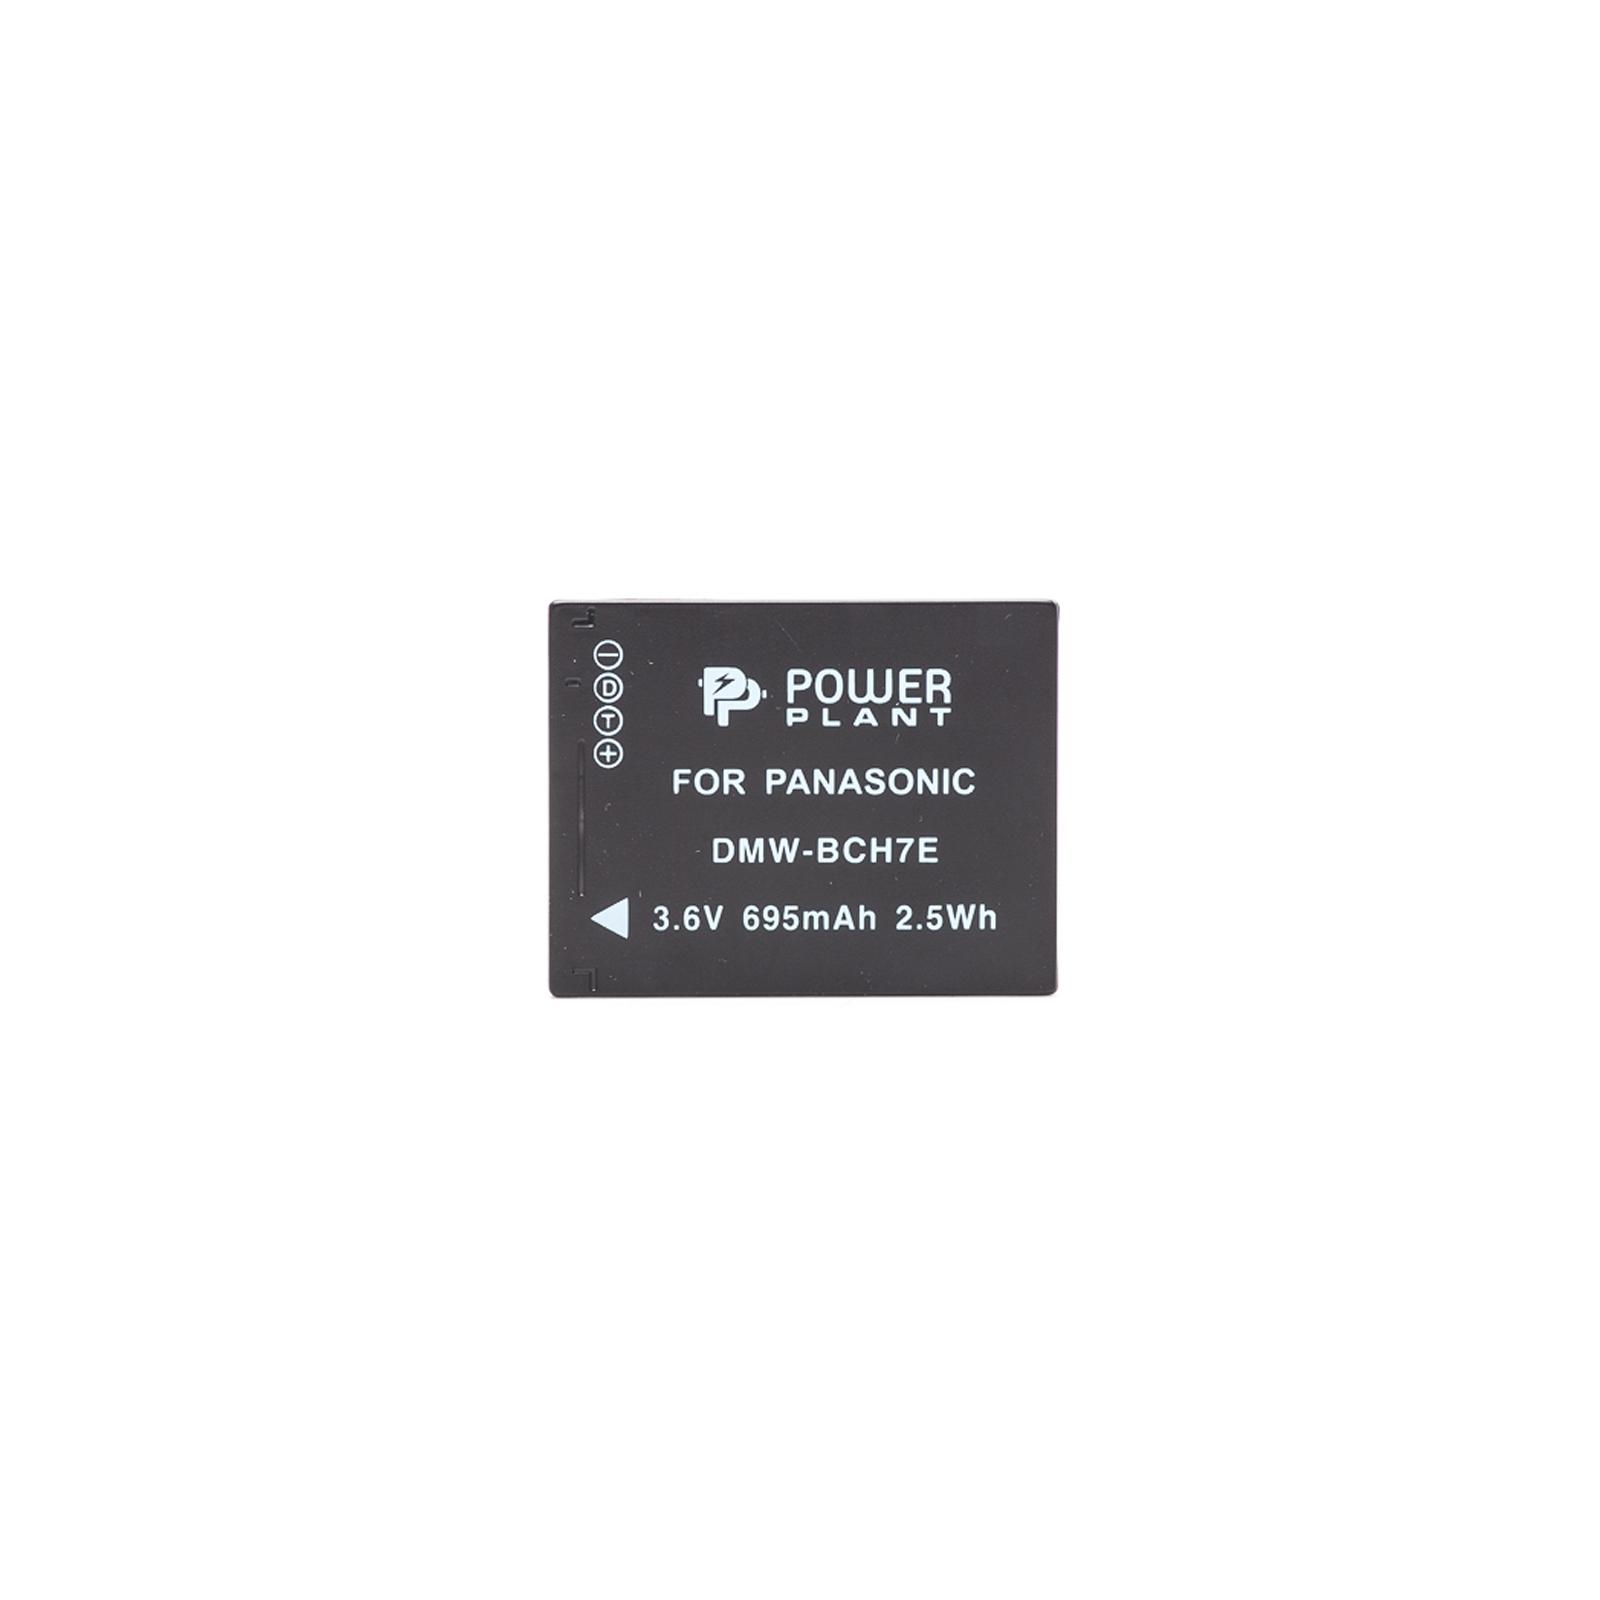 Аккумулятор к фото/видео PowerPlant Panasonic DMW-BCH7E (DV00DV1268)